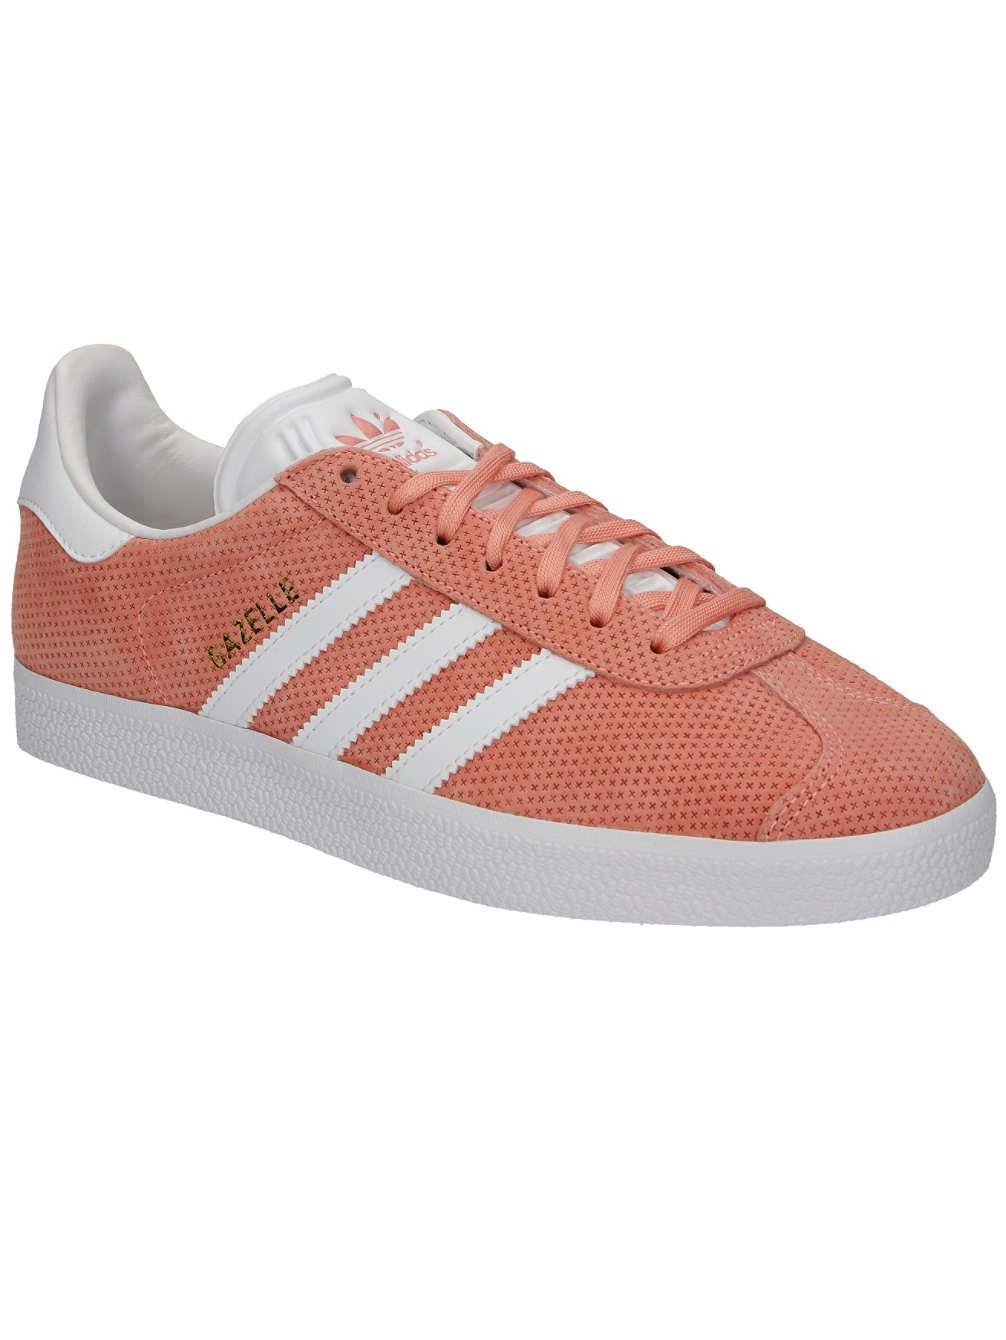 adidas Originals Damen Sneaker Gazelle Sneakers Frauen  65|Sun Glow S16/White/Gold